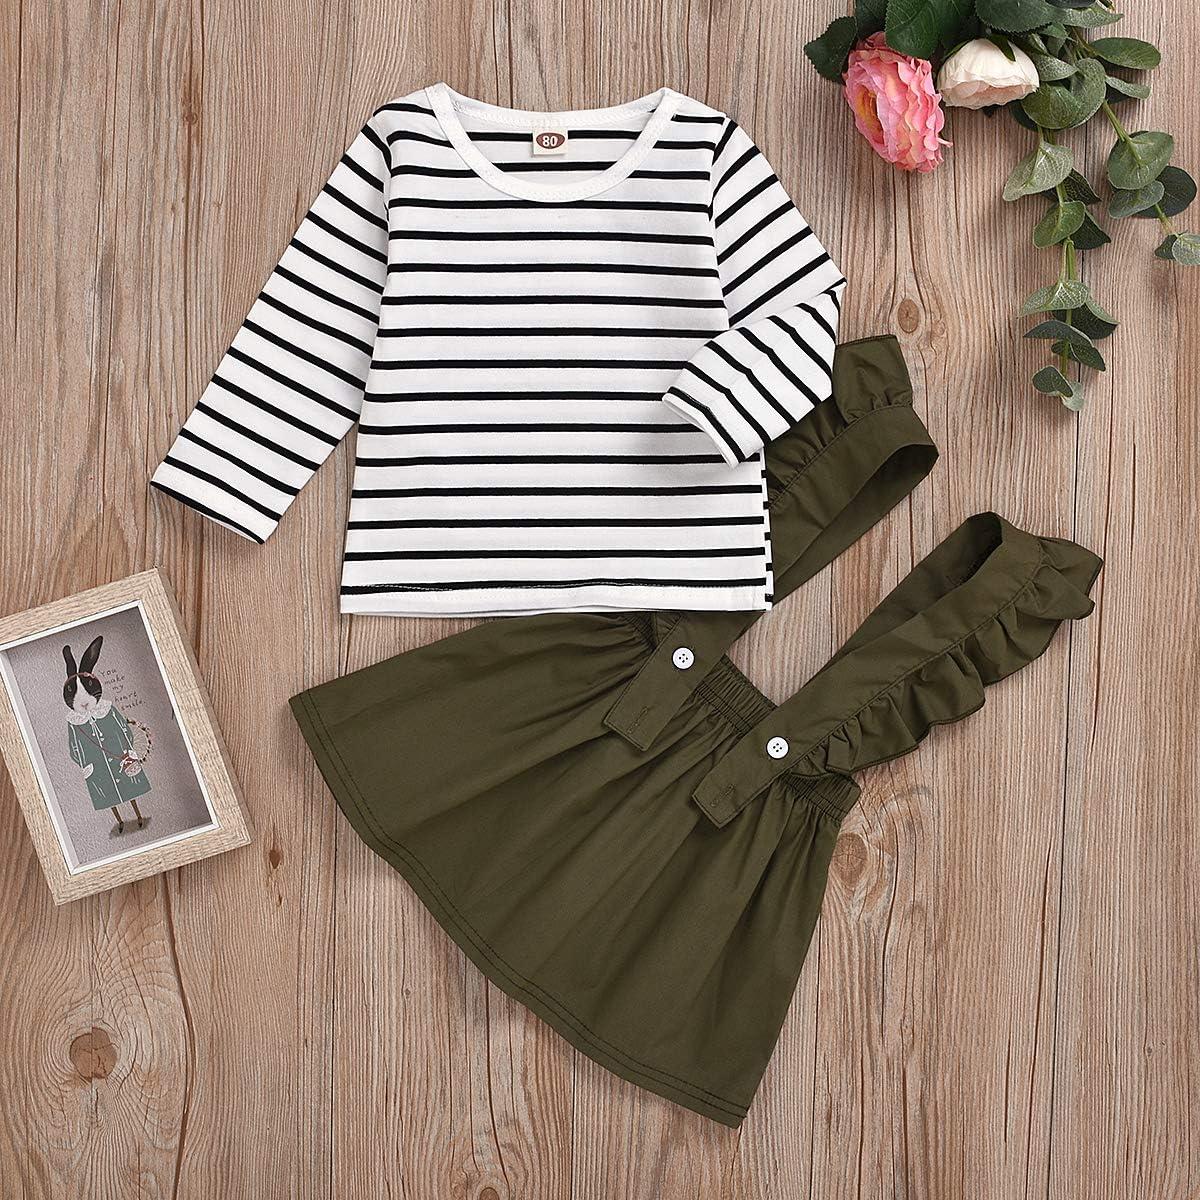 baskopa Baby Girl Kids Clothes Outfits Stripe Long Sleeve Sweatshirt Ruffle Suspender Dress Outfits